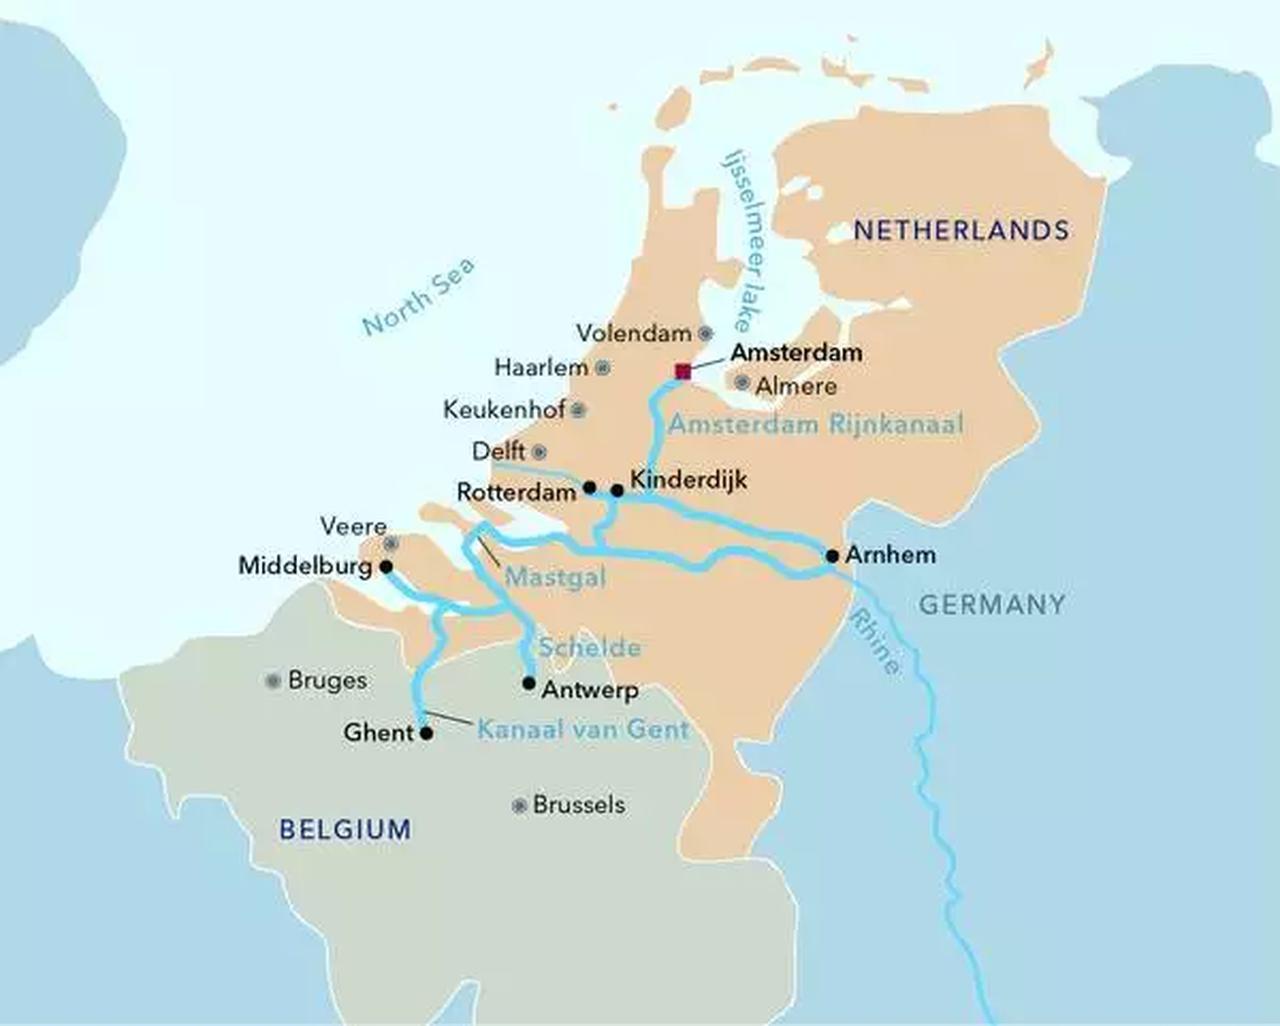 画像: 地図提供©️Lueftner cruises